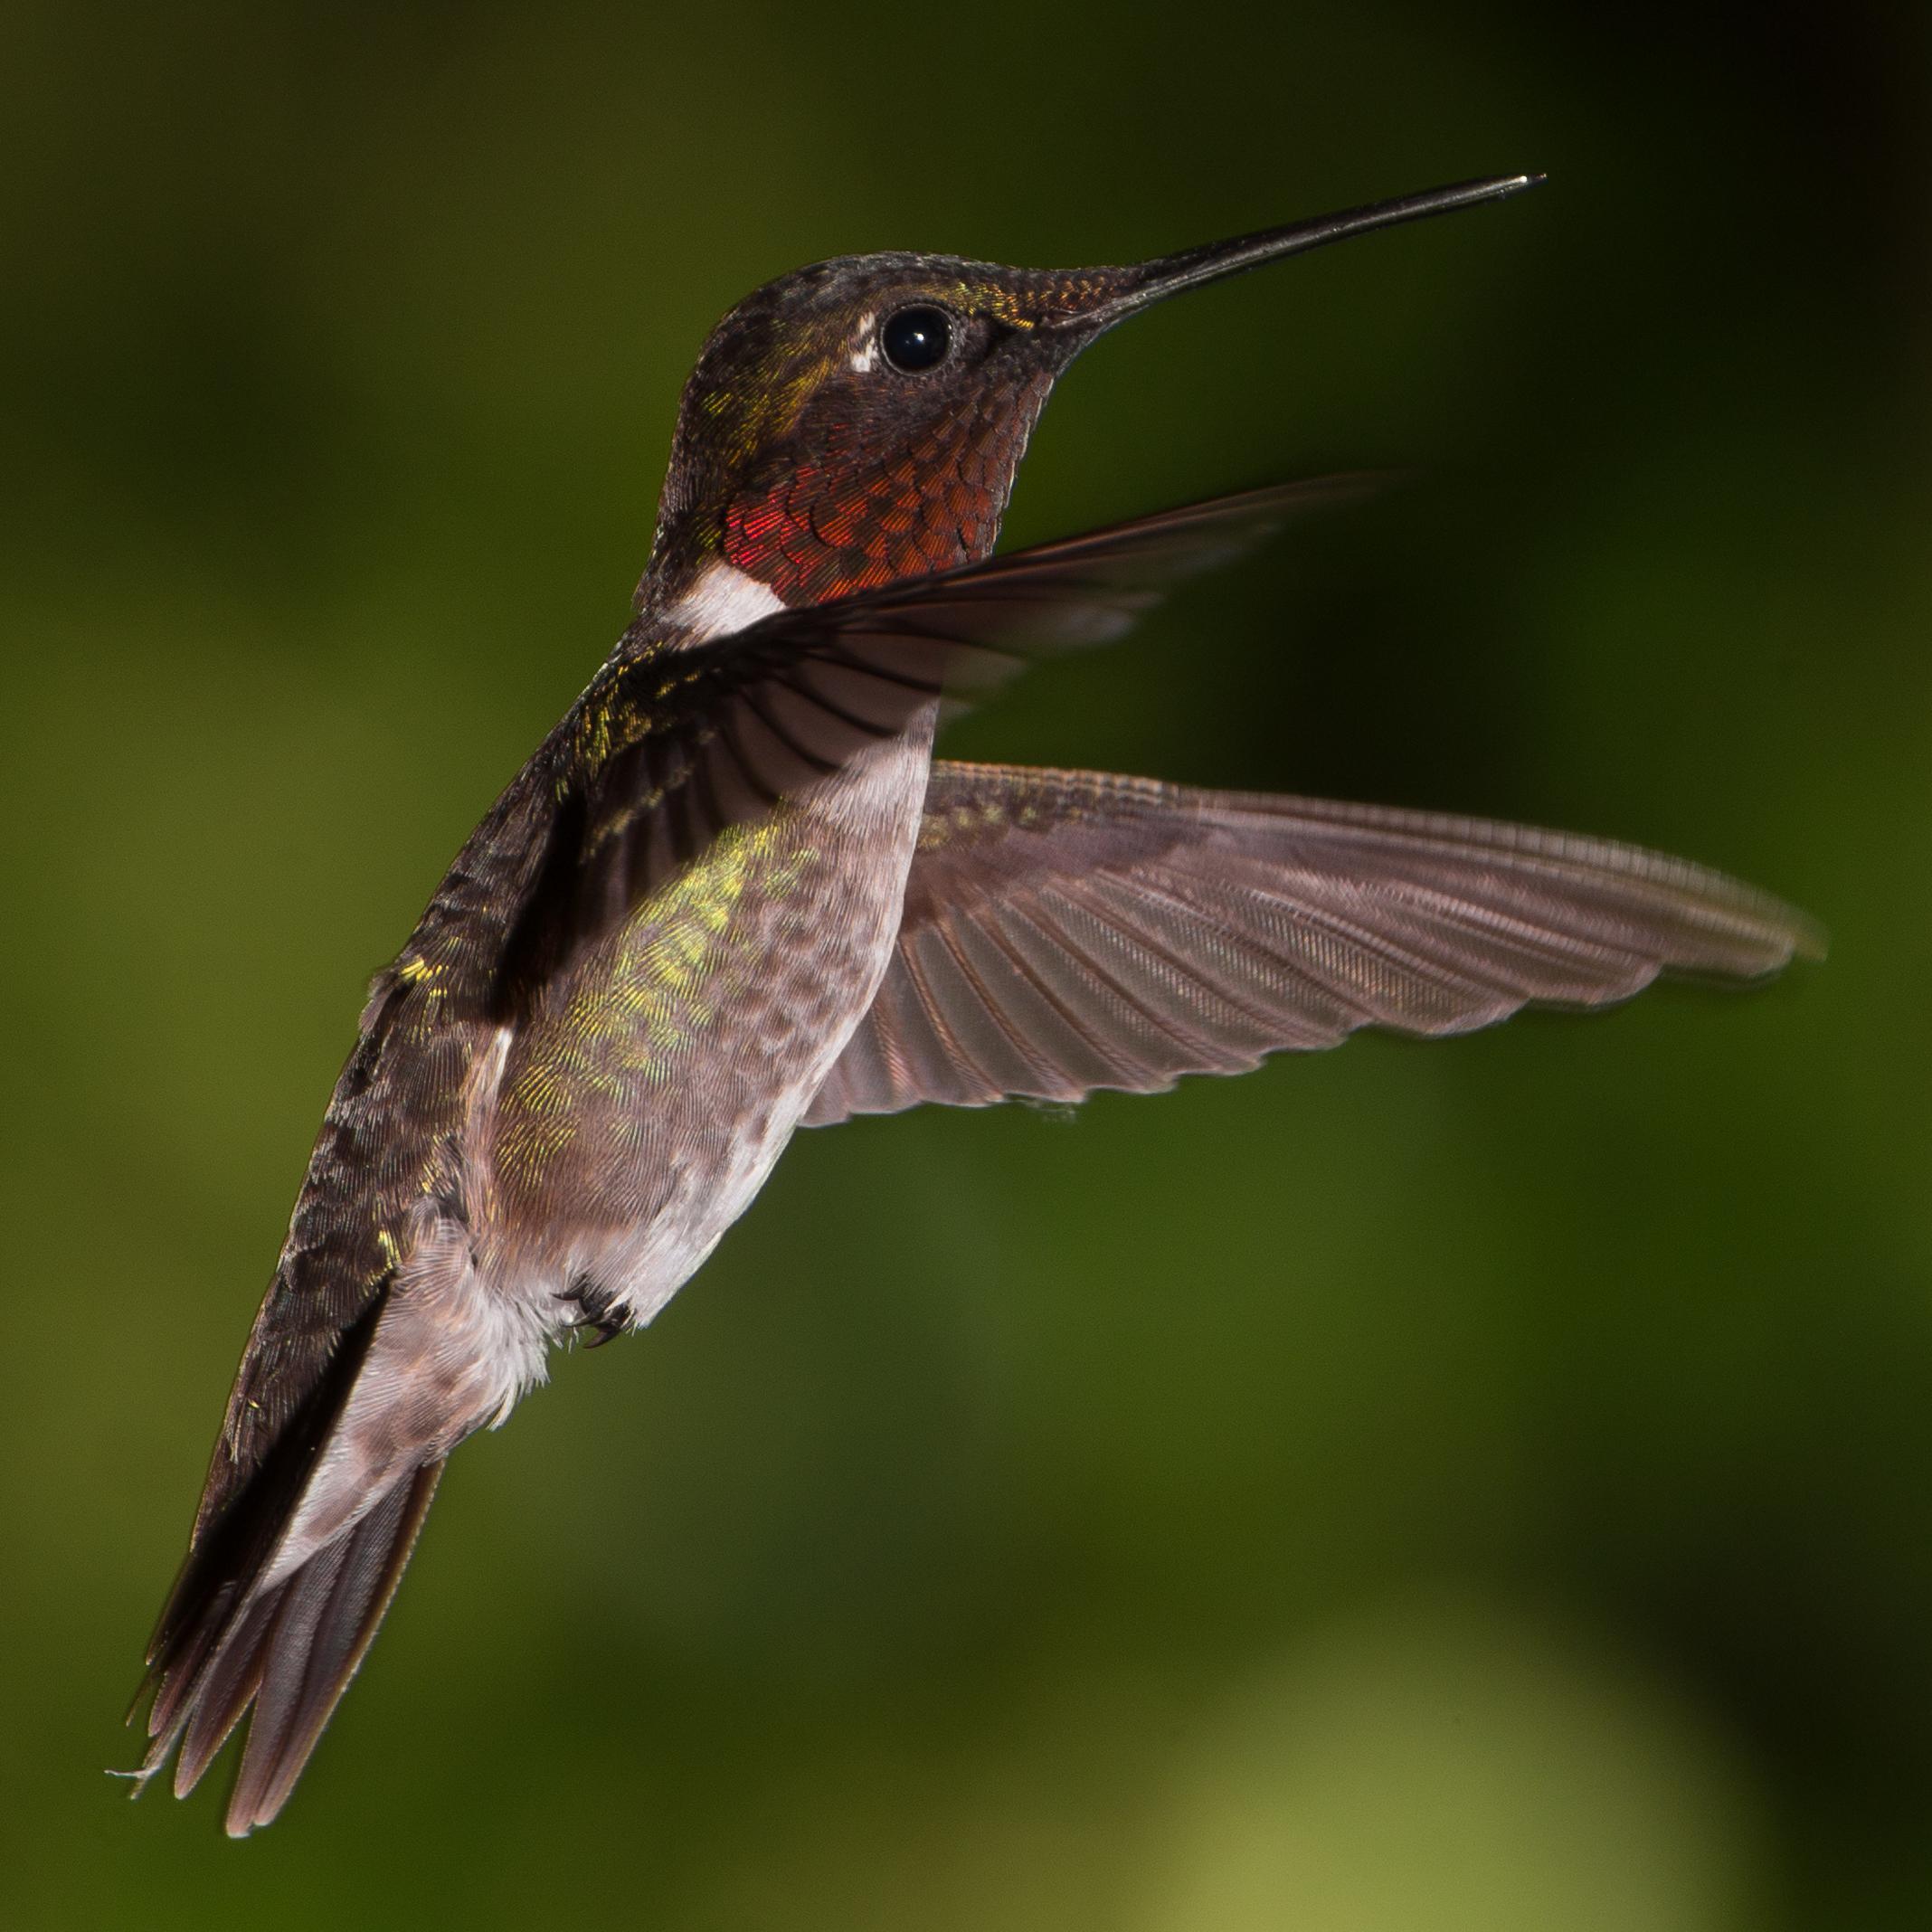 File:Male Ruby-Throated Hummingbird Hovering.jpg - Wikimedia Commons